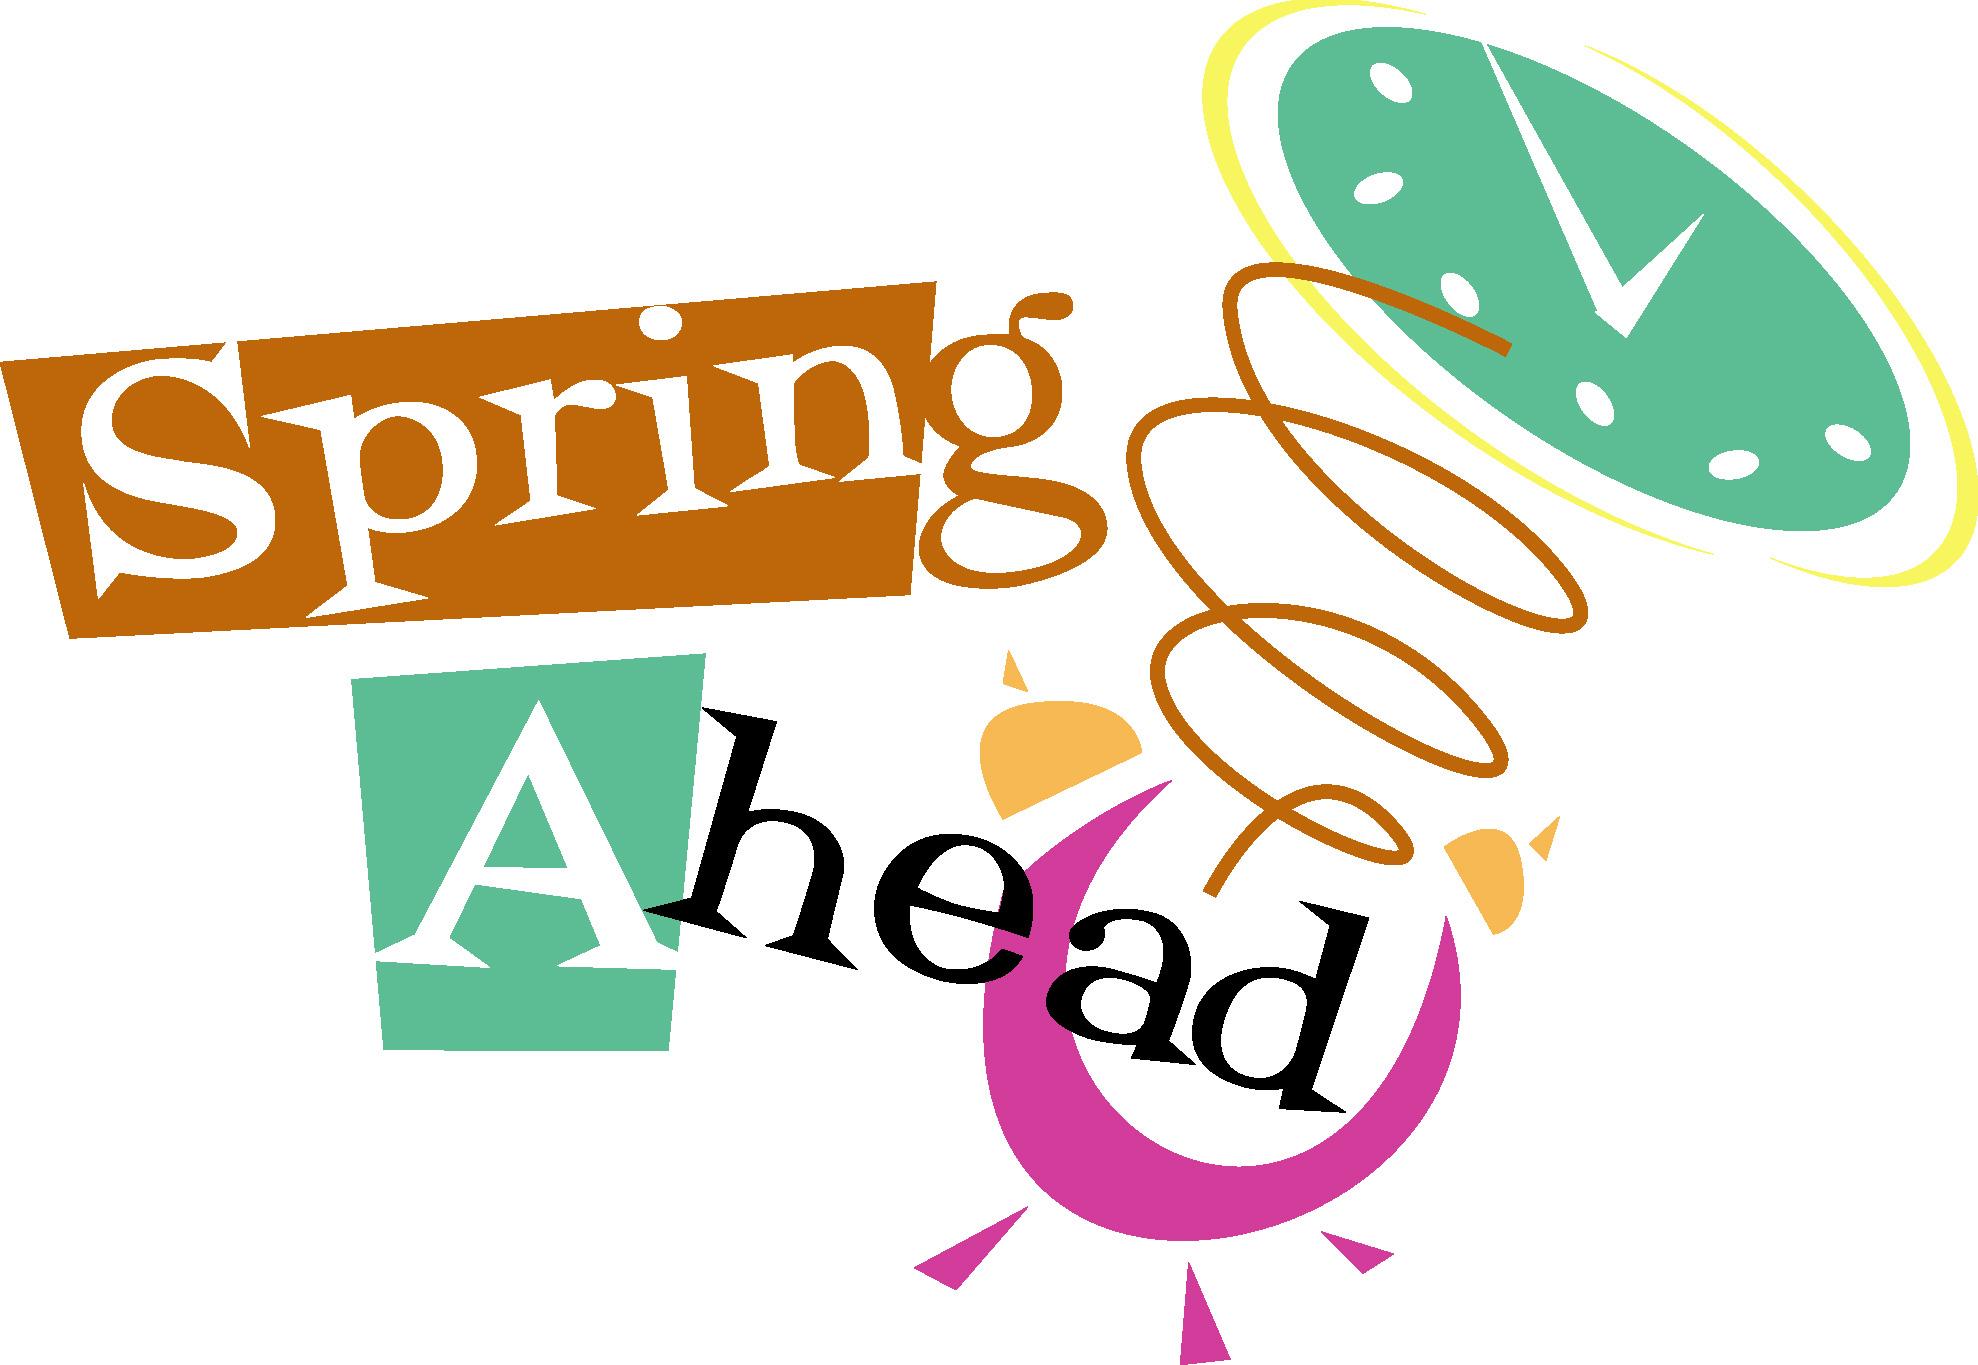 Spring ahead clip art.